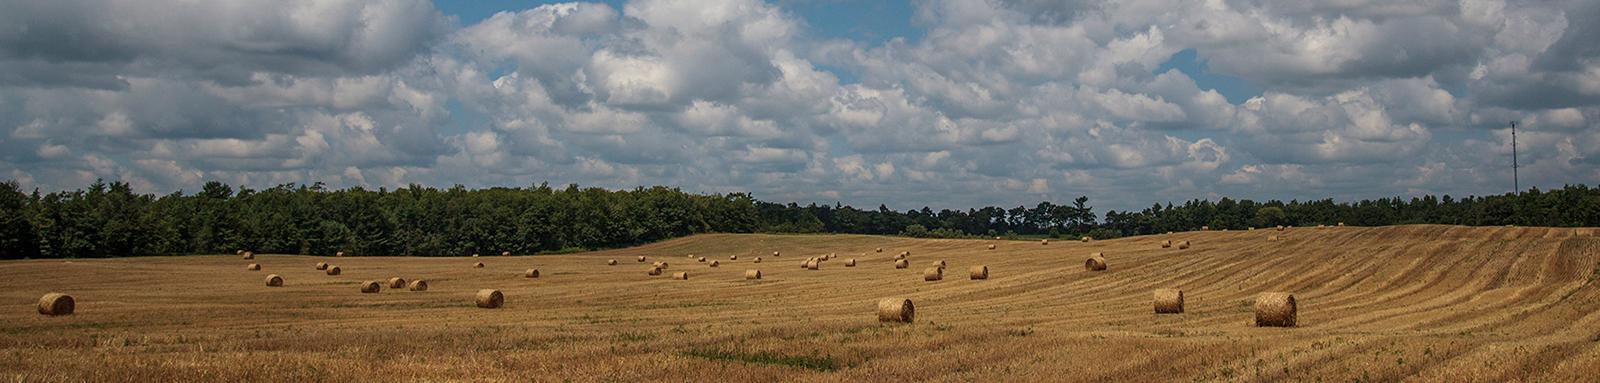 Image_4_Ganaraska-Northumberland-Forest-021.jpg